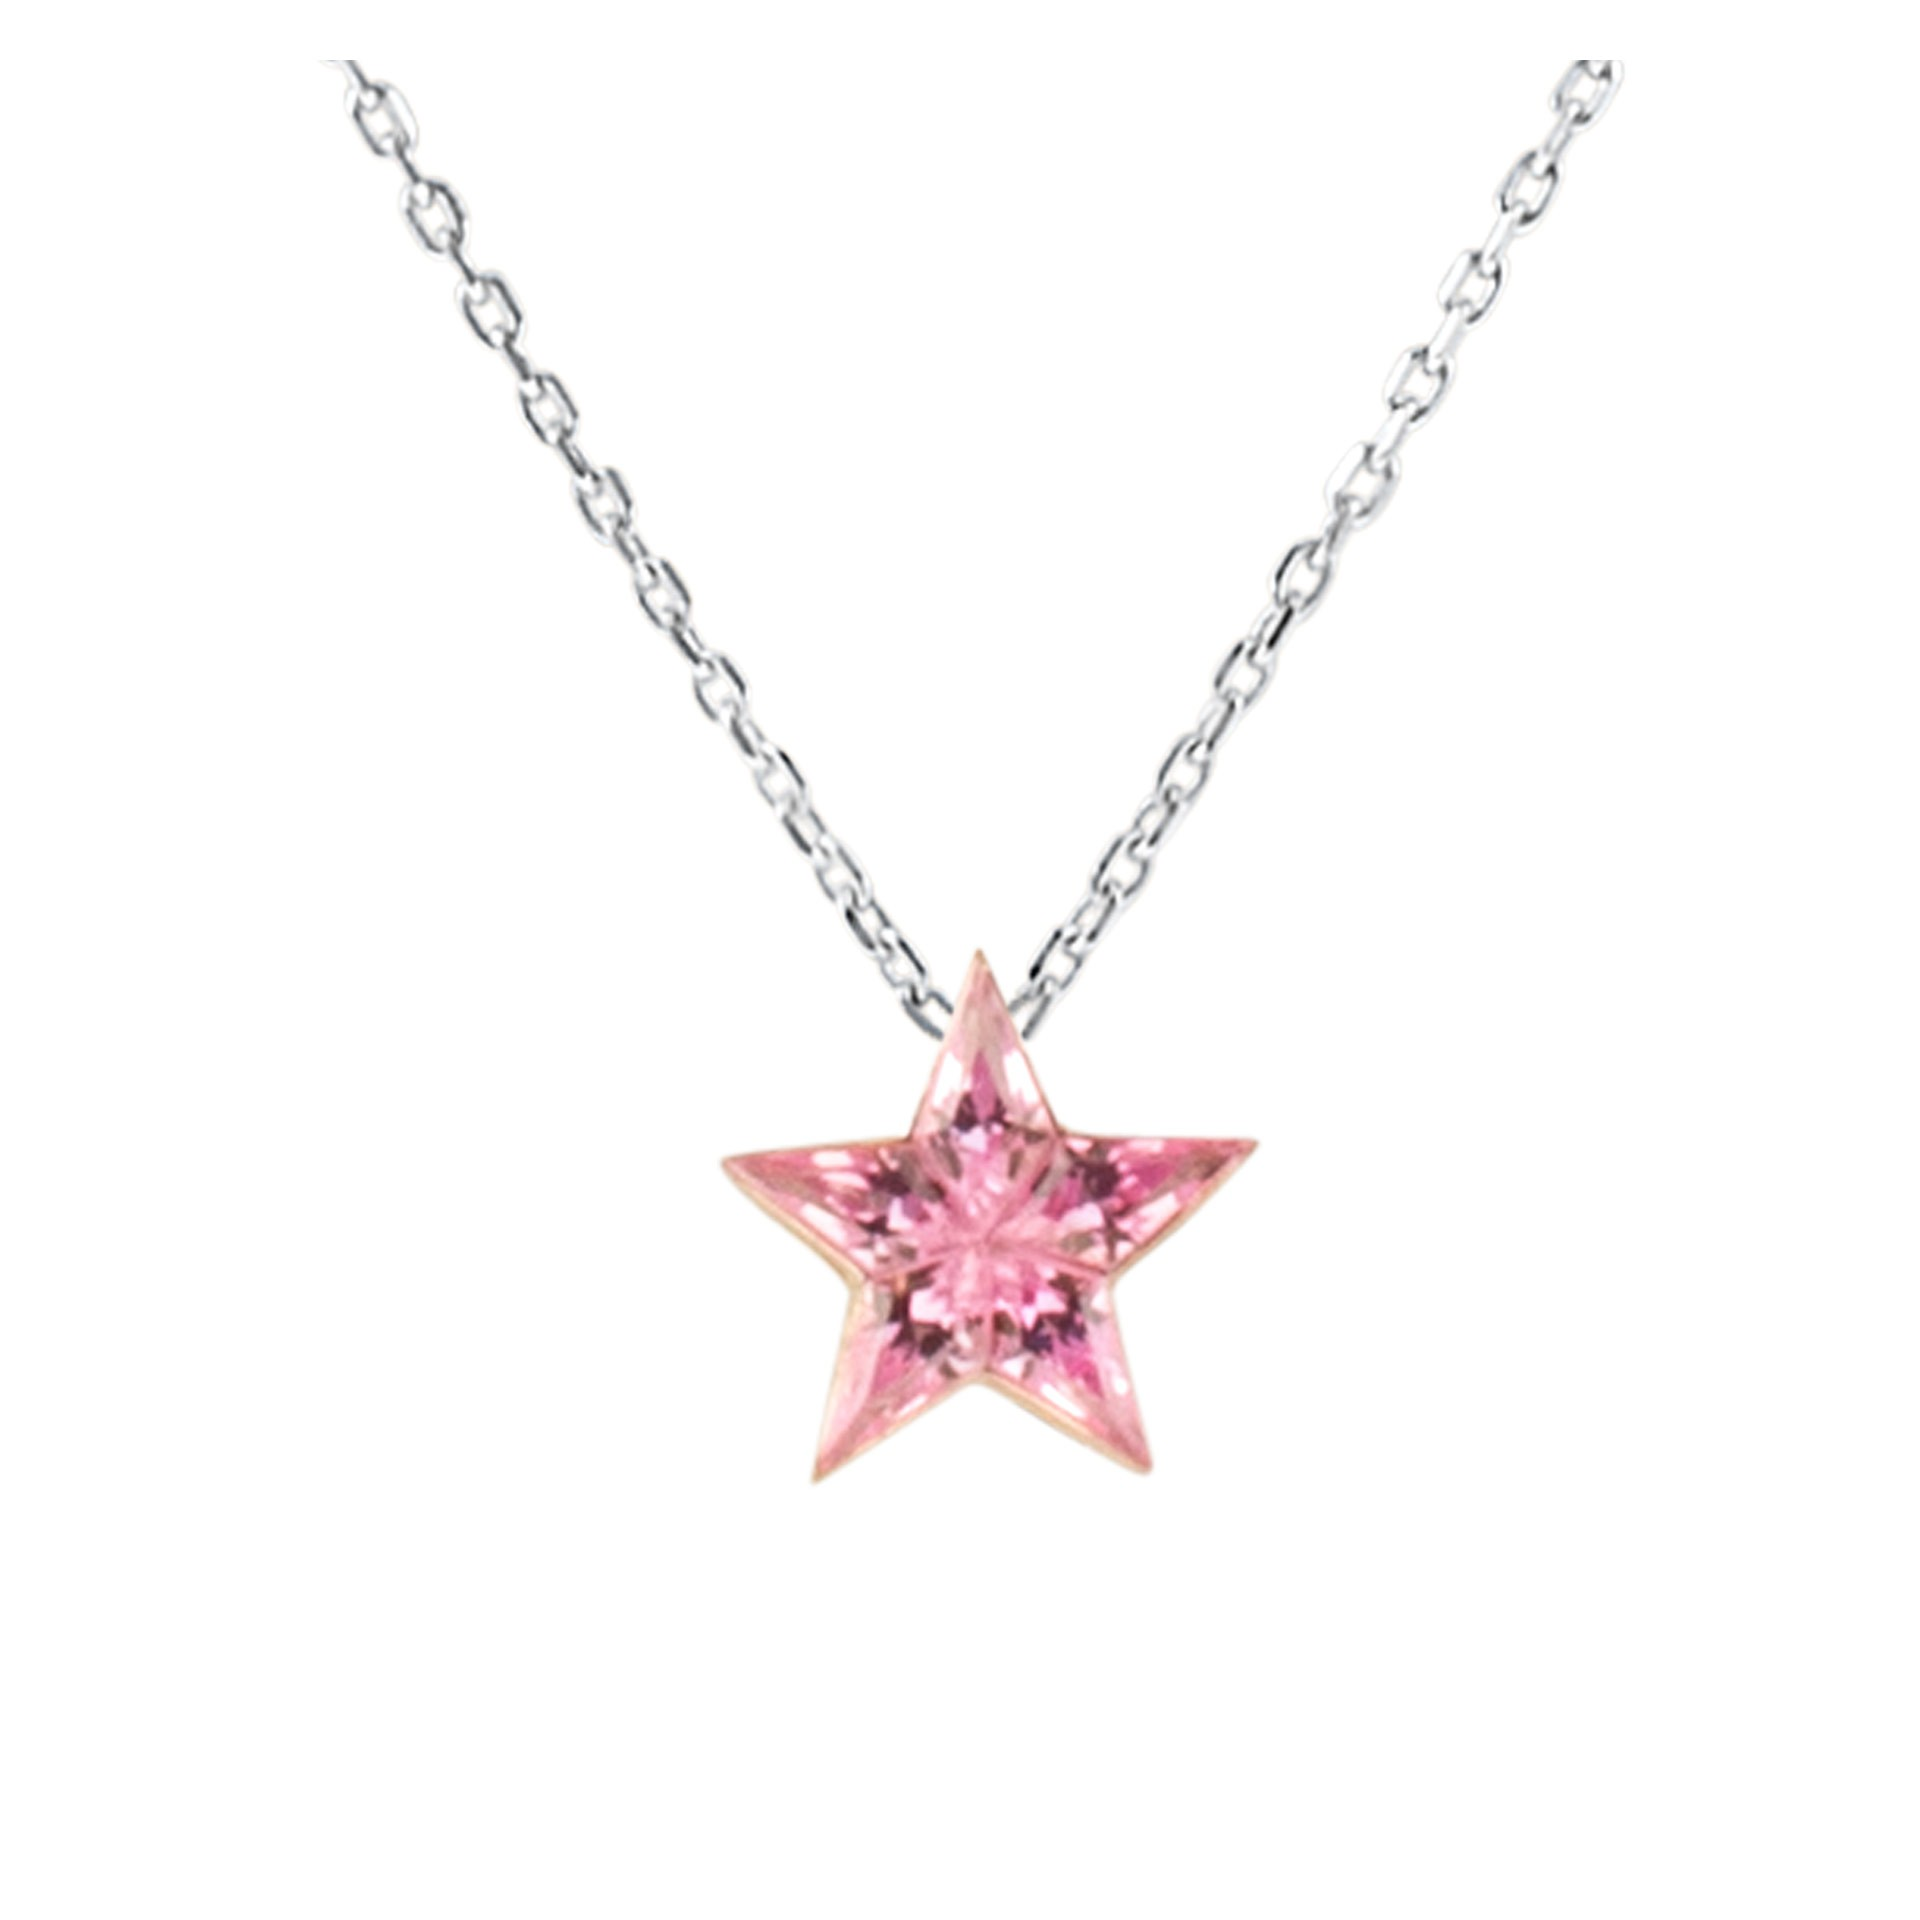 September Sapphire Birthstone Jewelry: Pink Sapphire Star Necklace